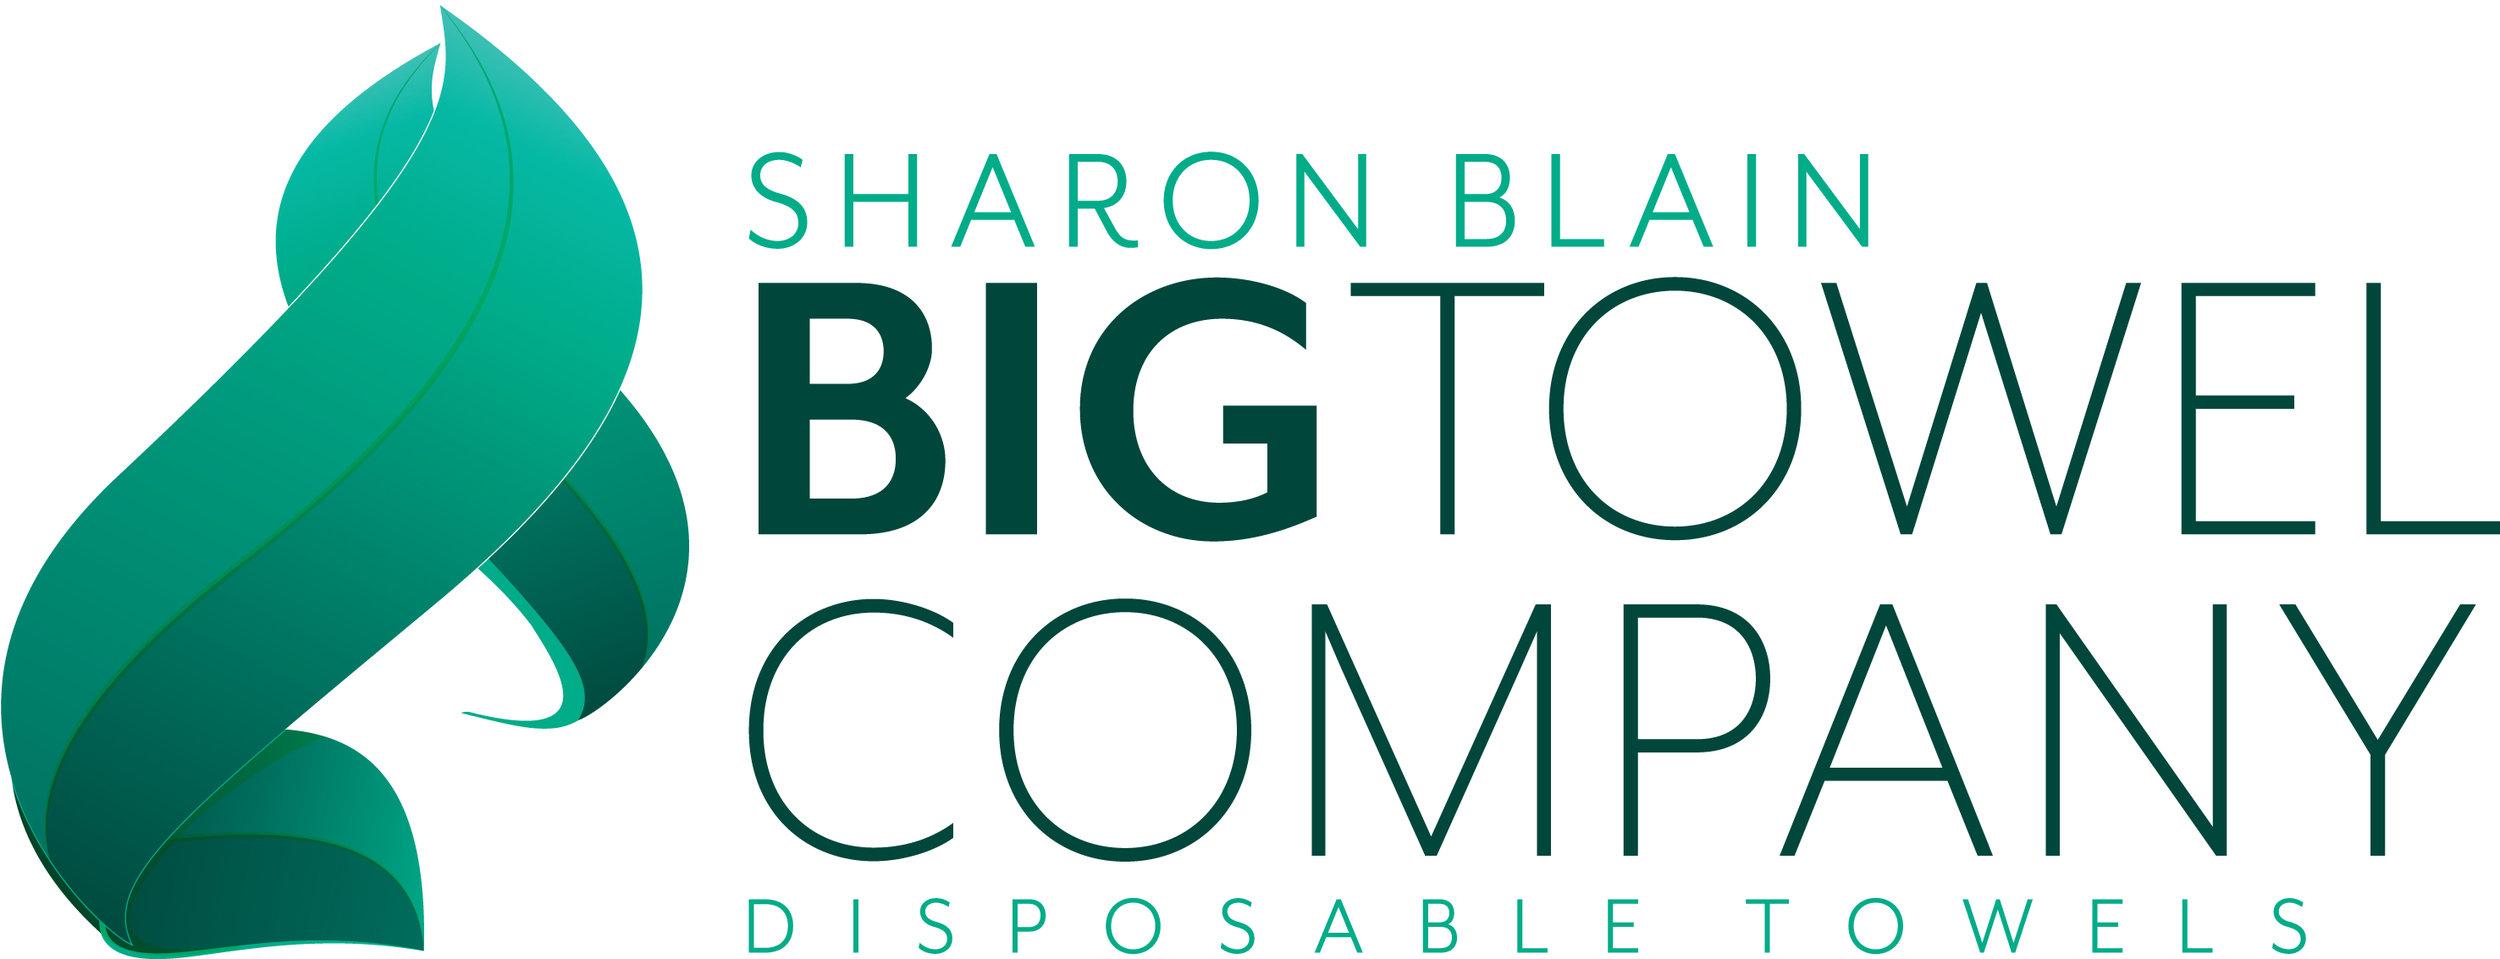 BigTowelCompany Logo.jpg